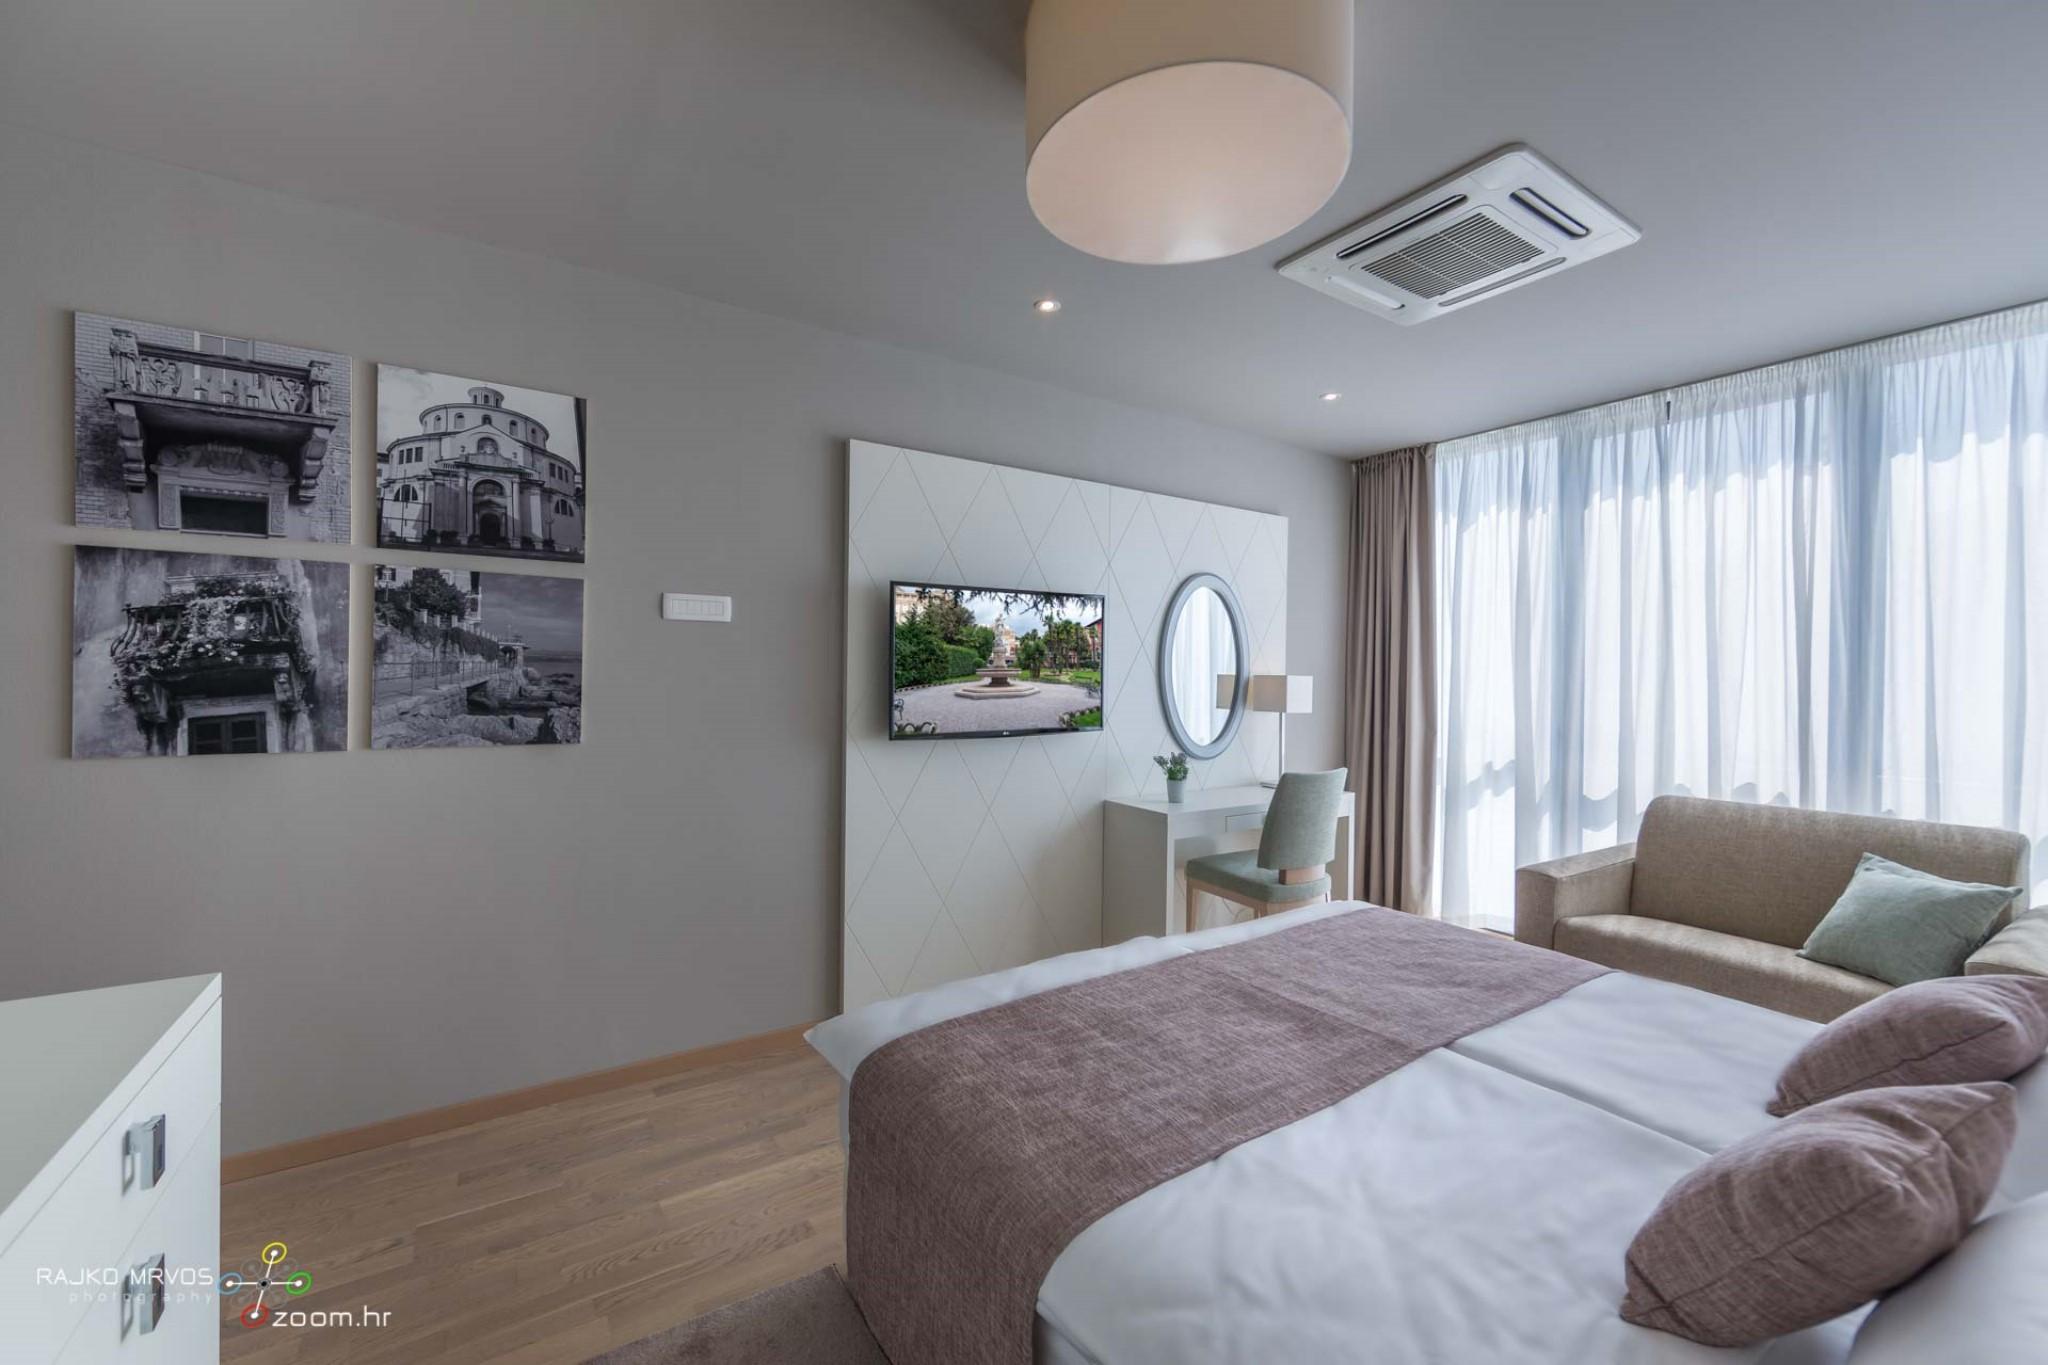 fotografiranje-interijera-fotograf-eksterijera-apartmana-vila-kuca-apartmani-Preelook-88